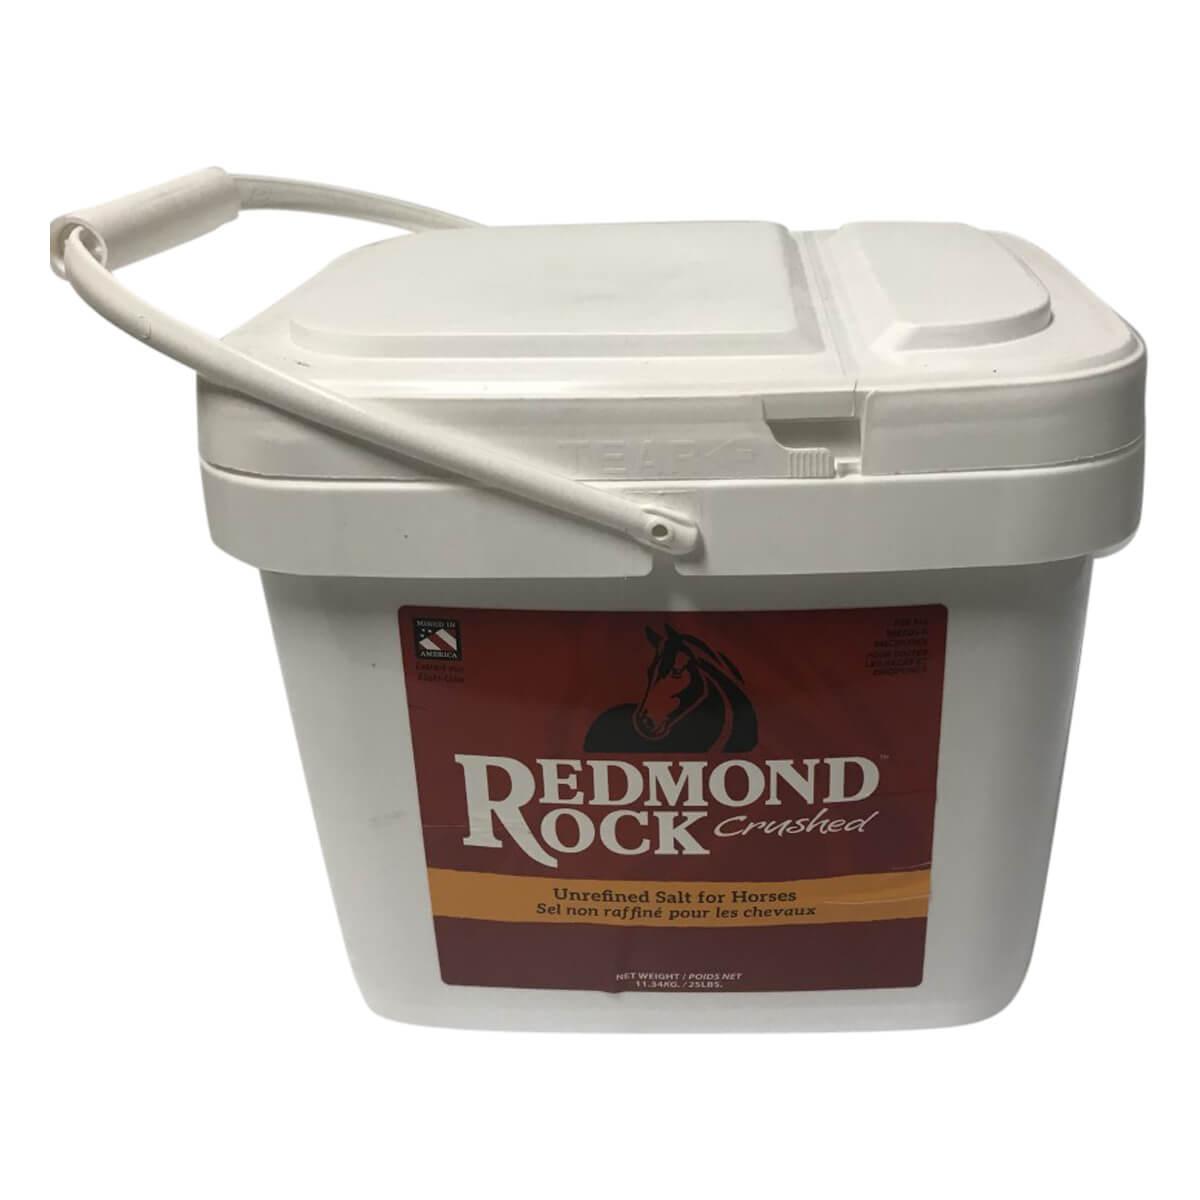 Crushed Redmond Rock - 25 lb